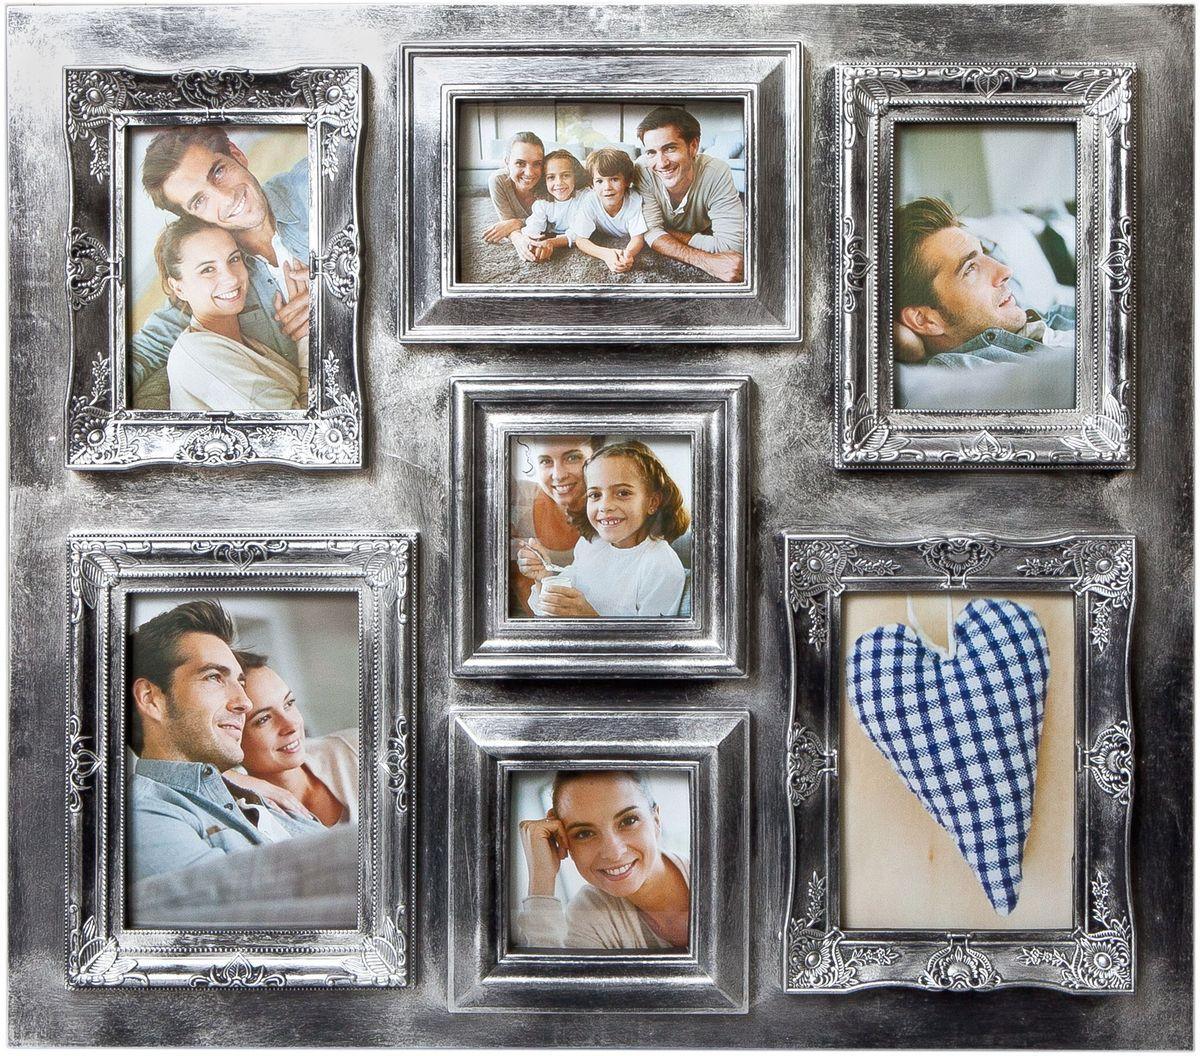 Коллаж Platinum, цвет: серебристый, 7 фоторамок. BIN-112137PLATINUM BIN-112137 Серебряный (Silver)Пластиковый коллаж с 5 фото 10х15, 2 фото 10х10.